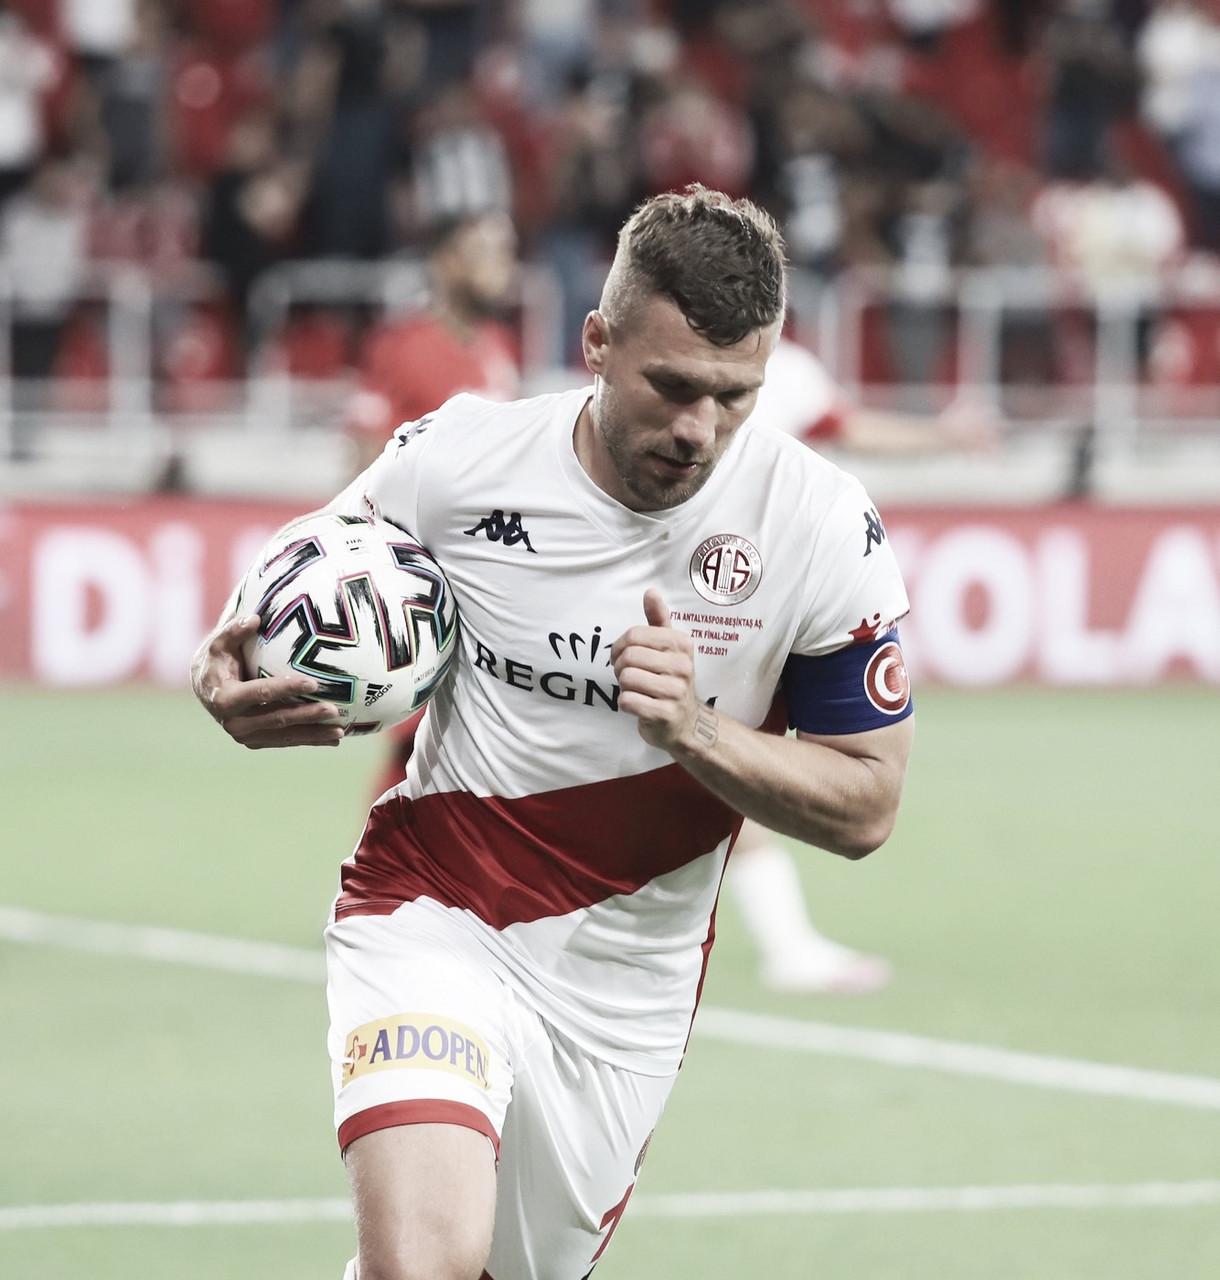 Amor de infância e aposentadoria: a ida de Podolski ao Górnik Zabrze/POL